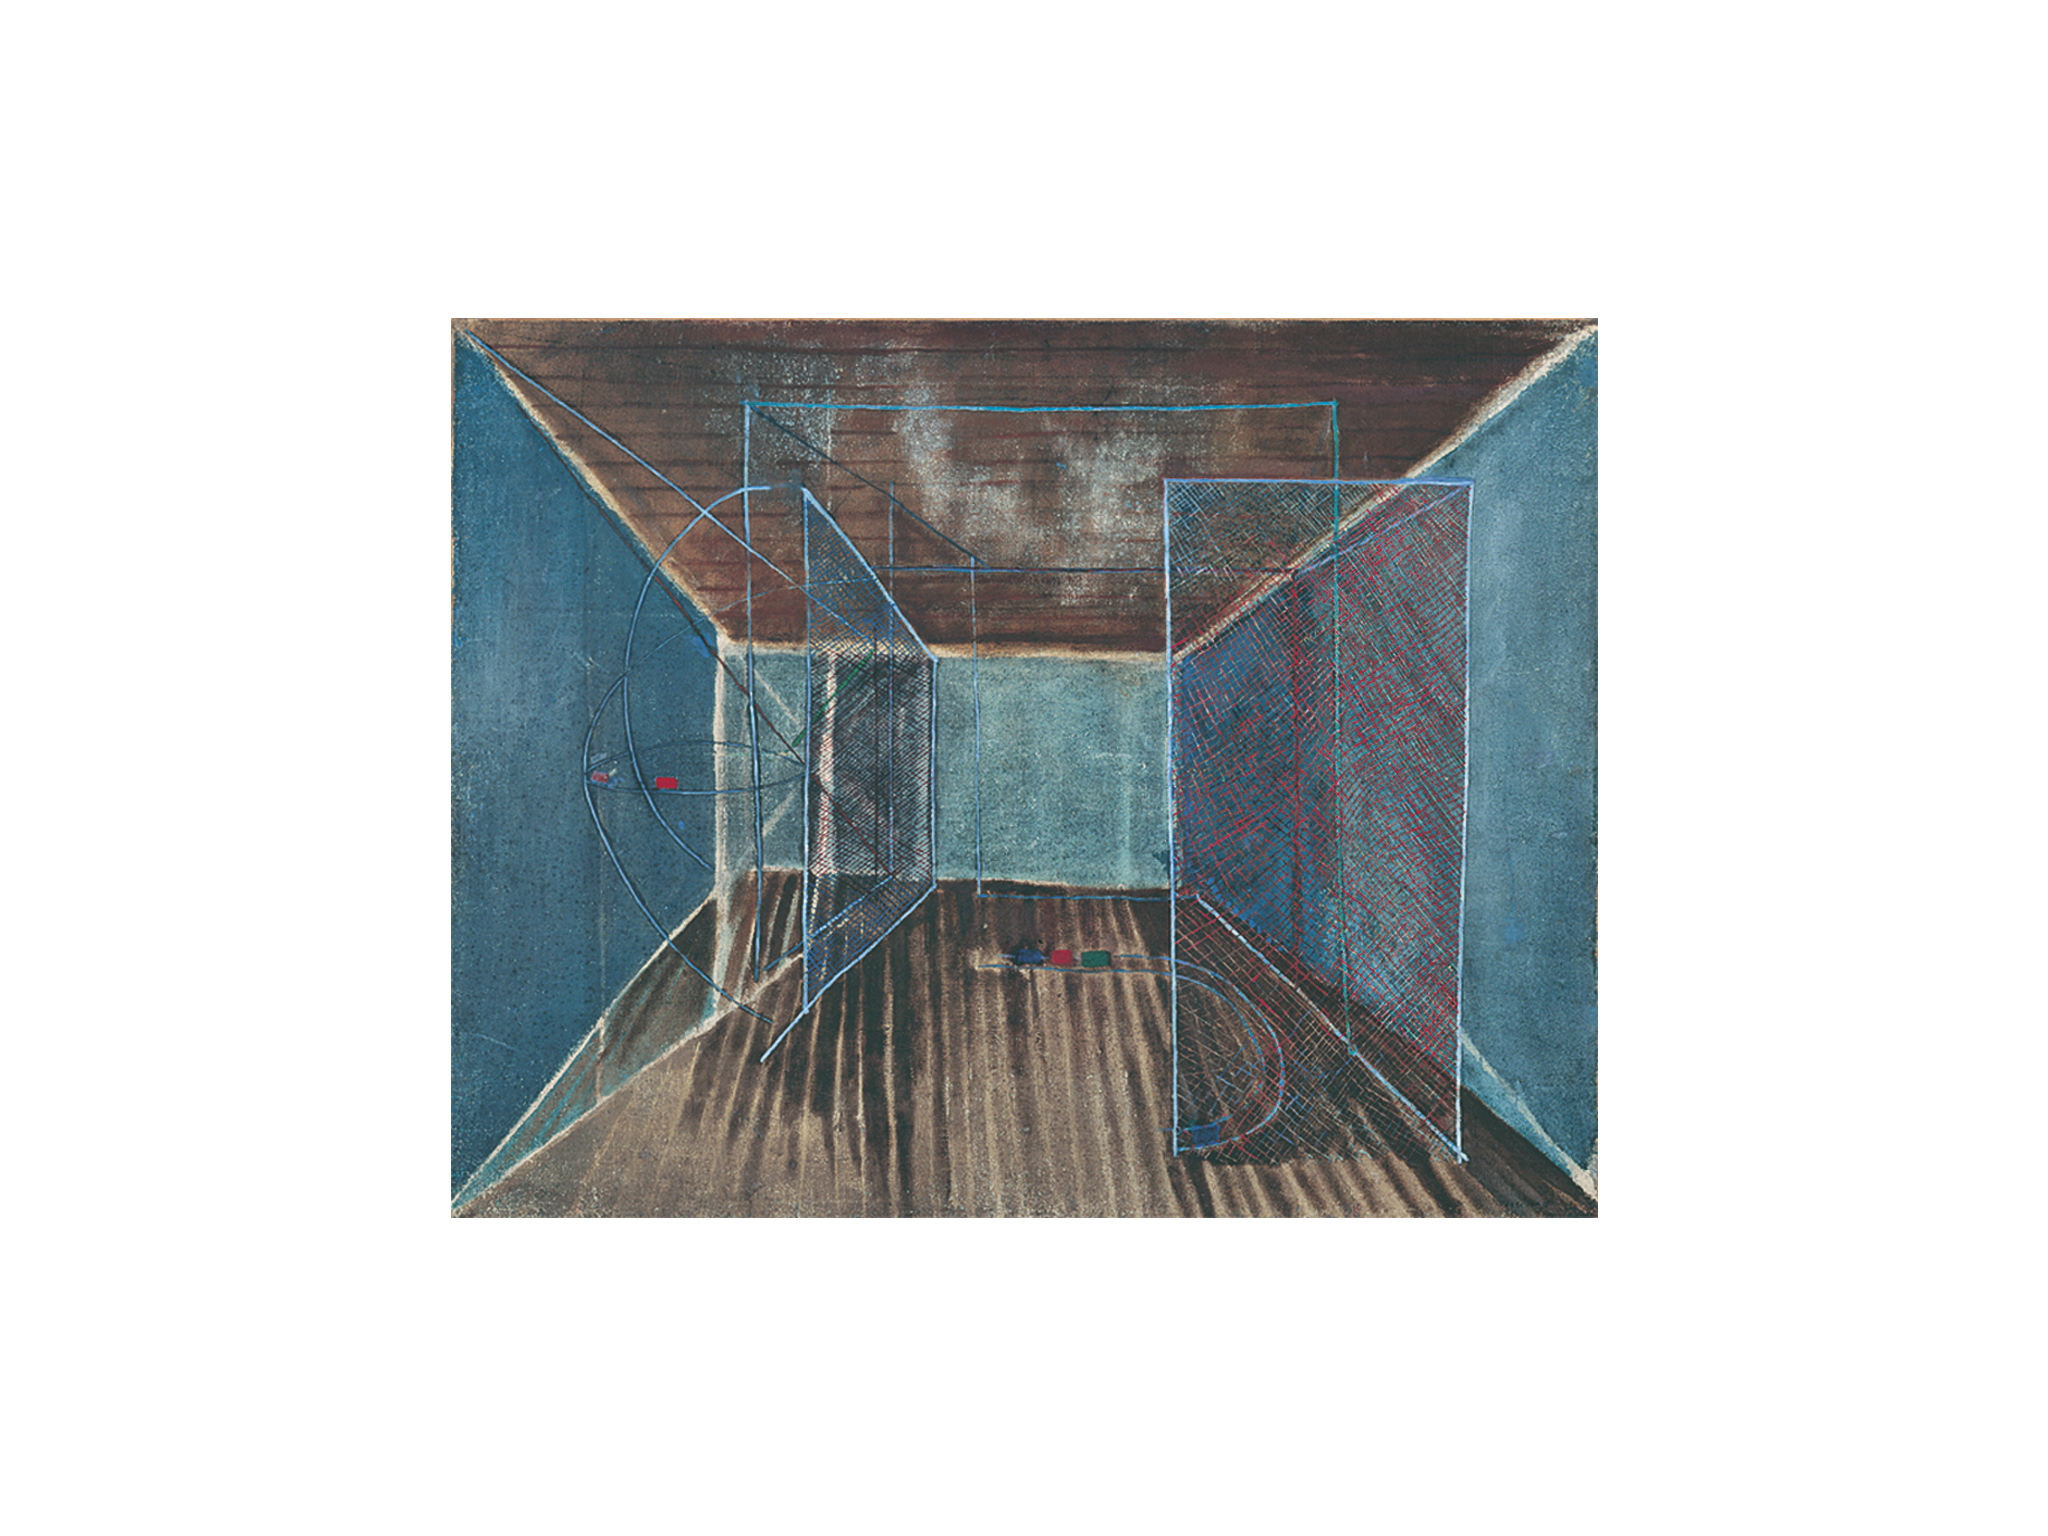 atelier lisbonne no museu arpad szenes-viera da silva